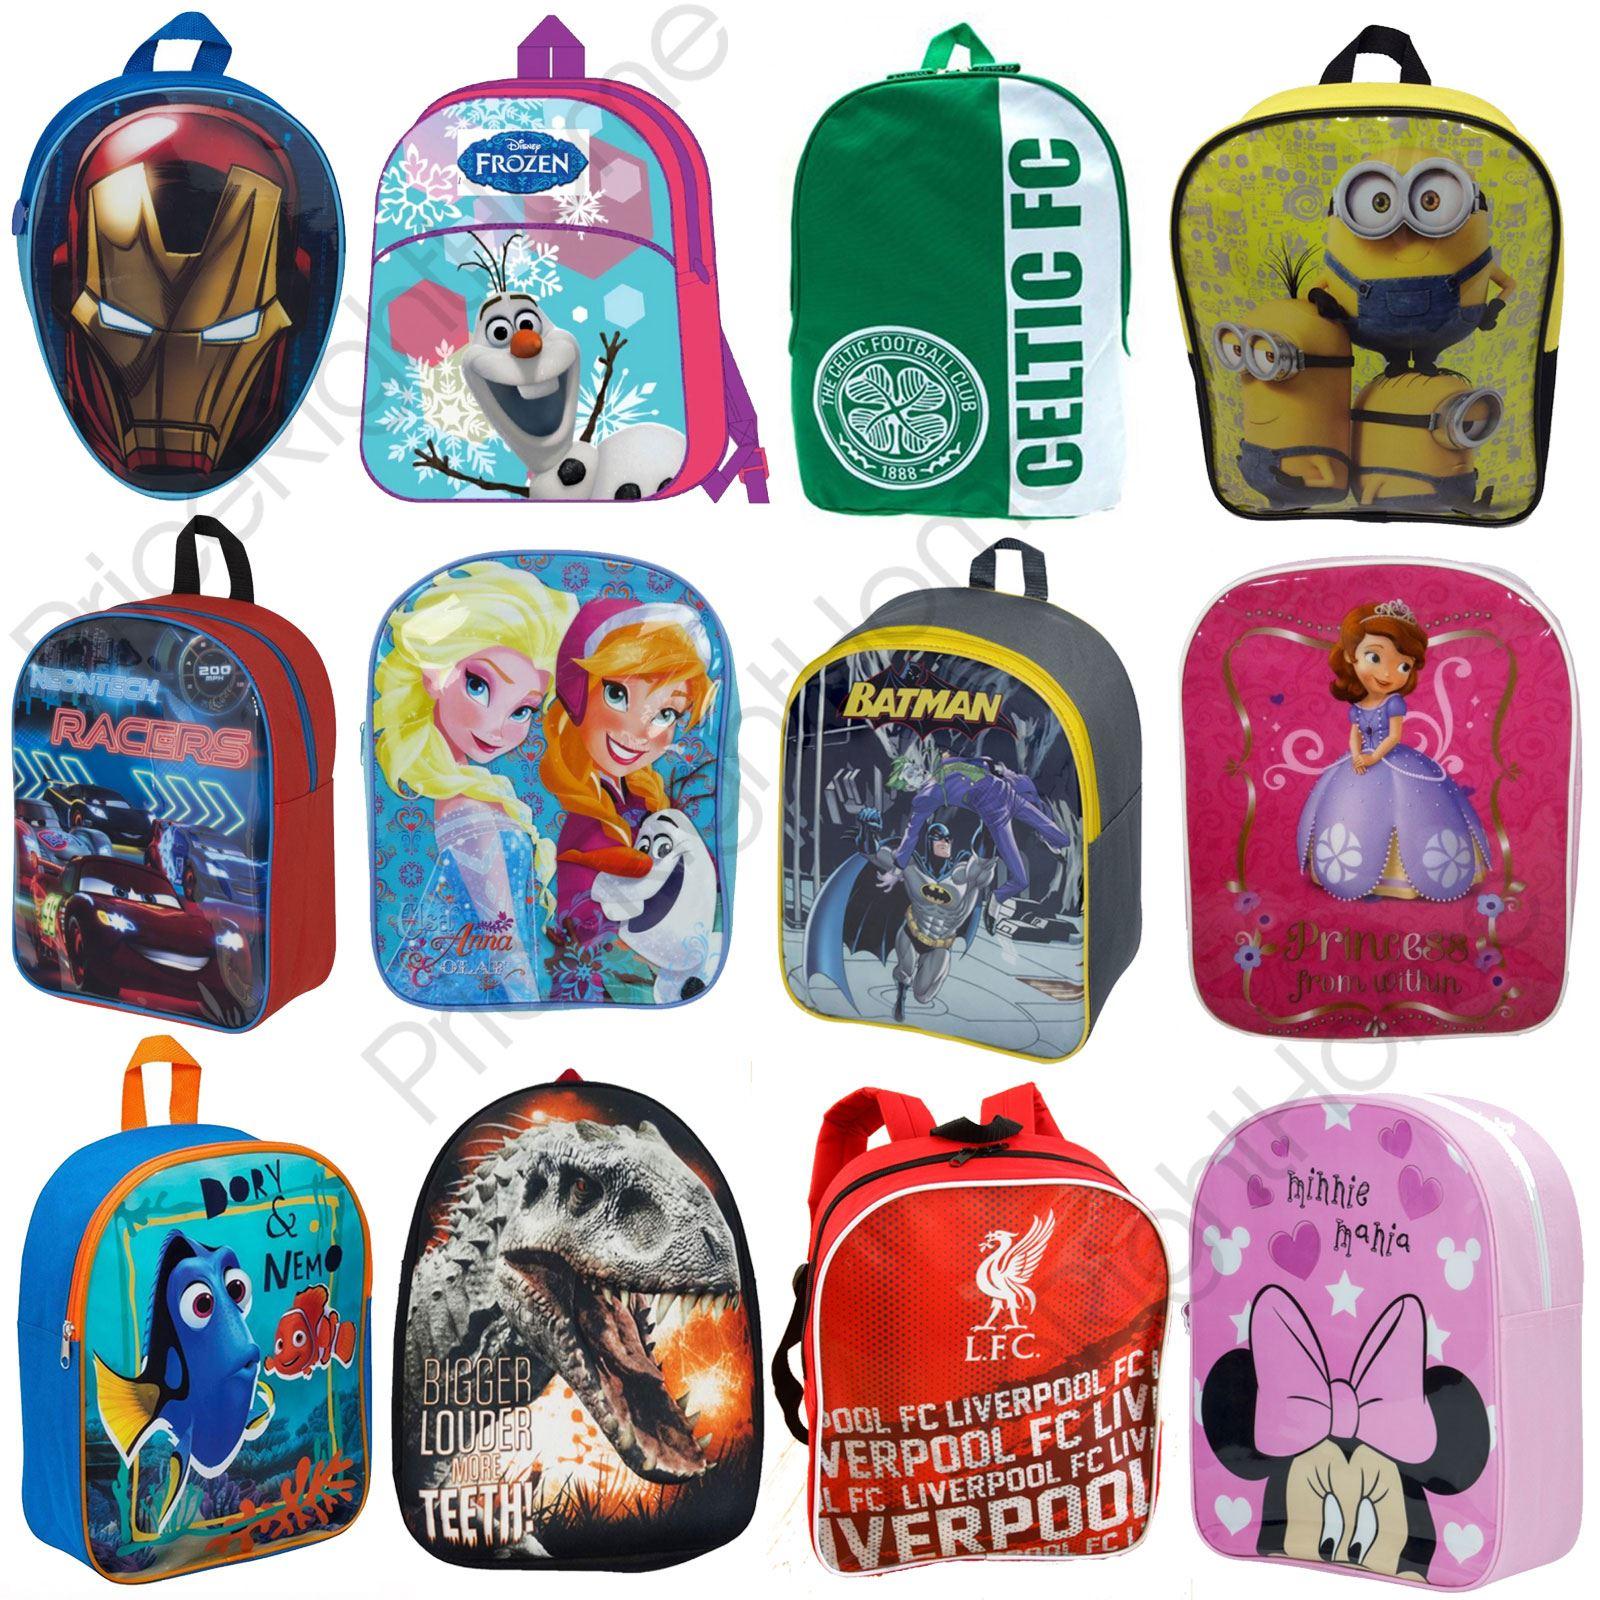 82f434013d KIDS CHARACTER BACKPACKS BOYS   GIRLS SCHOOL BAGS POKEMON PAW PATROL DORY  NEW